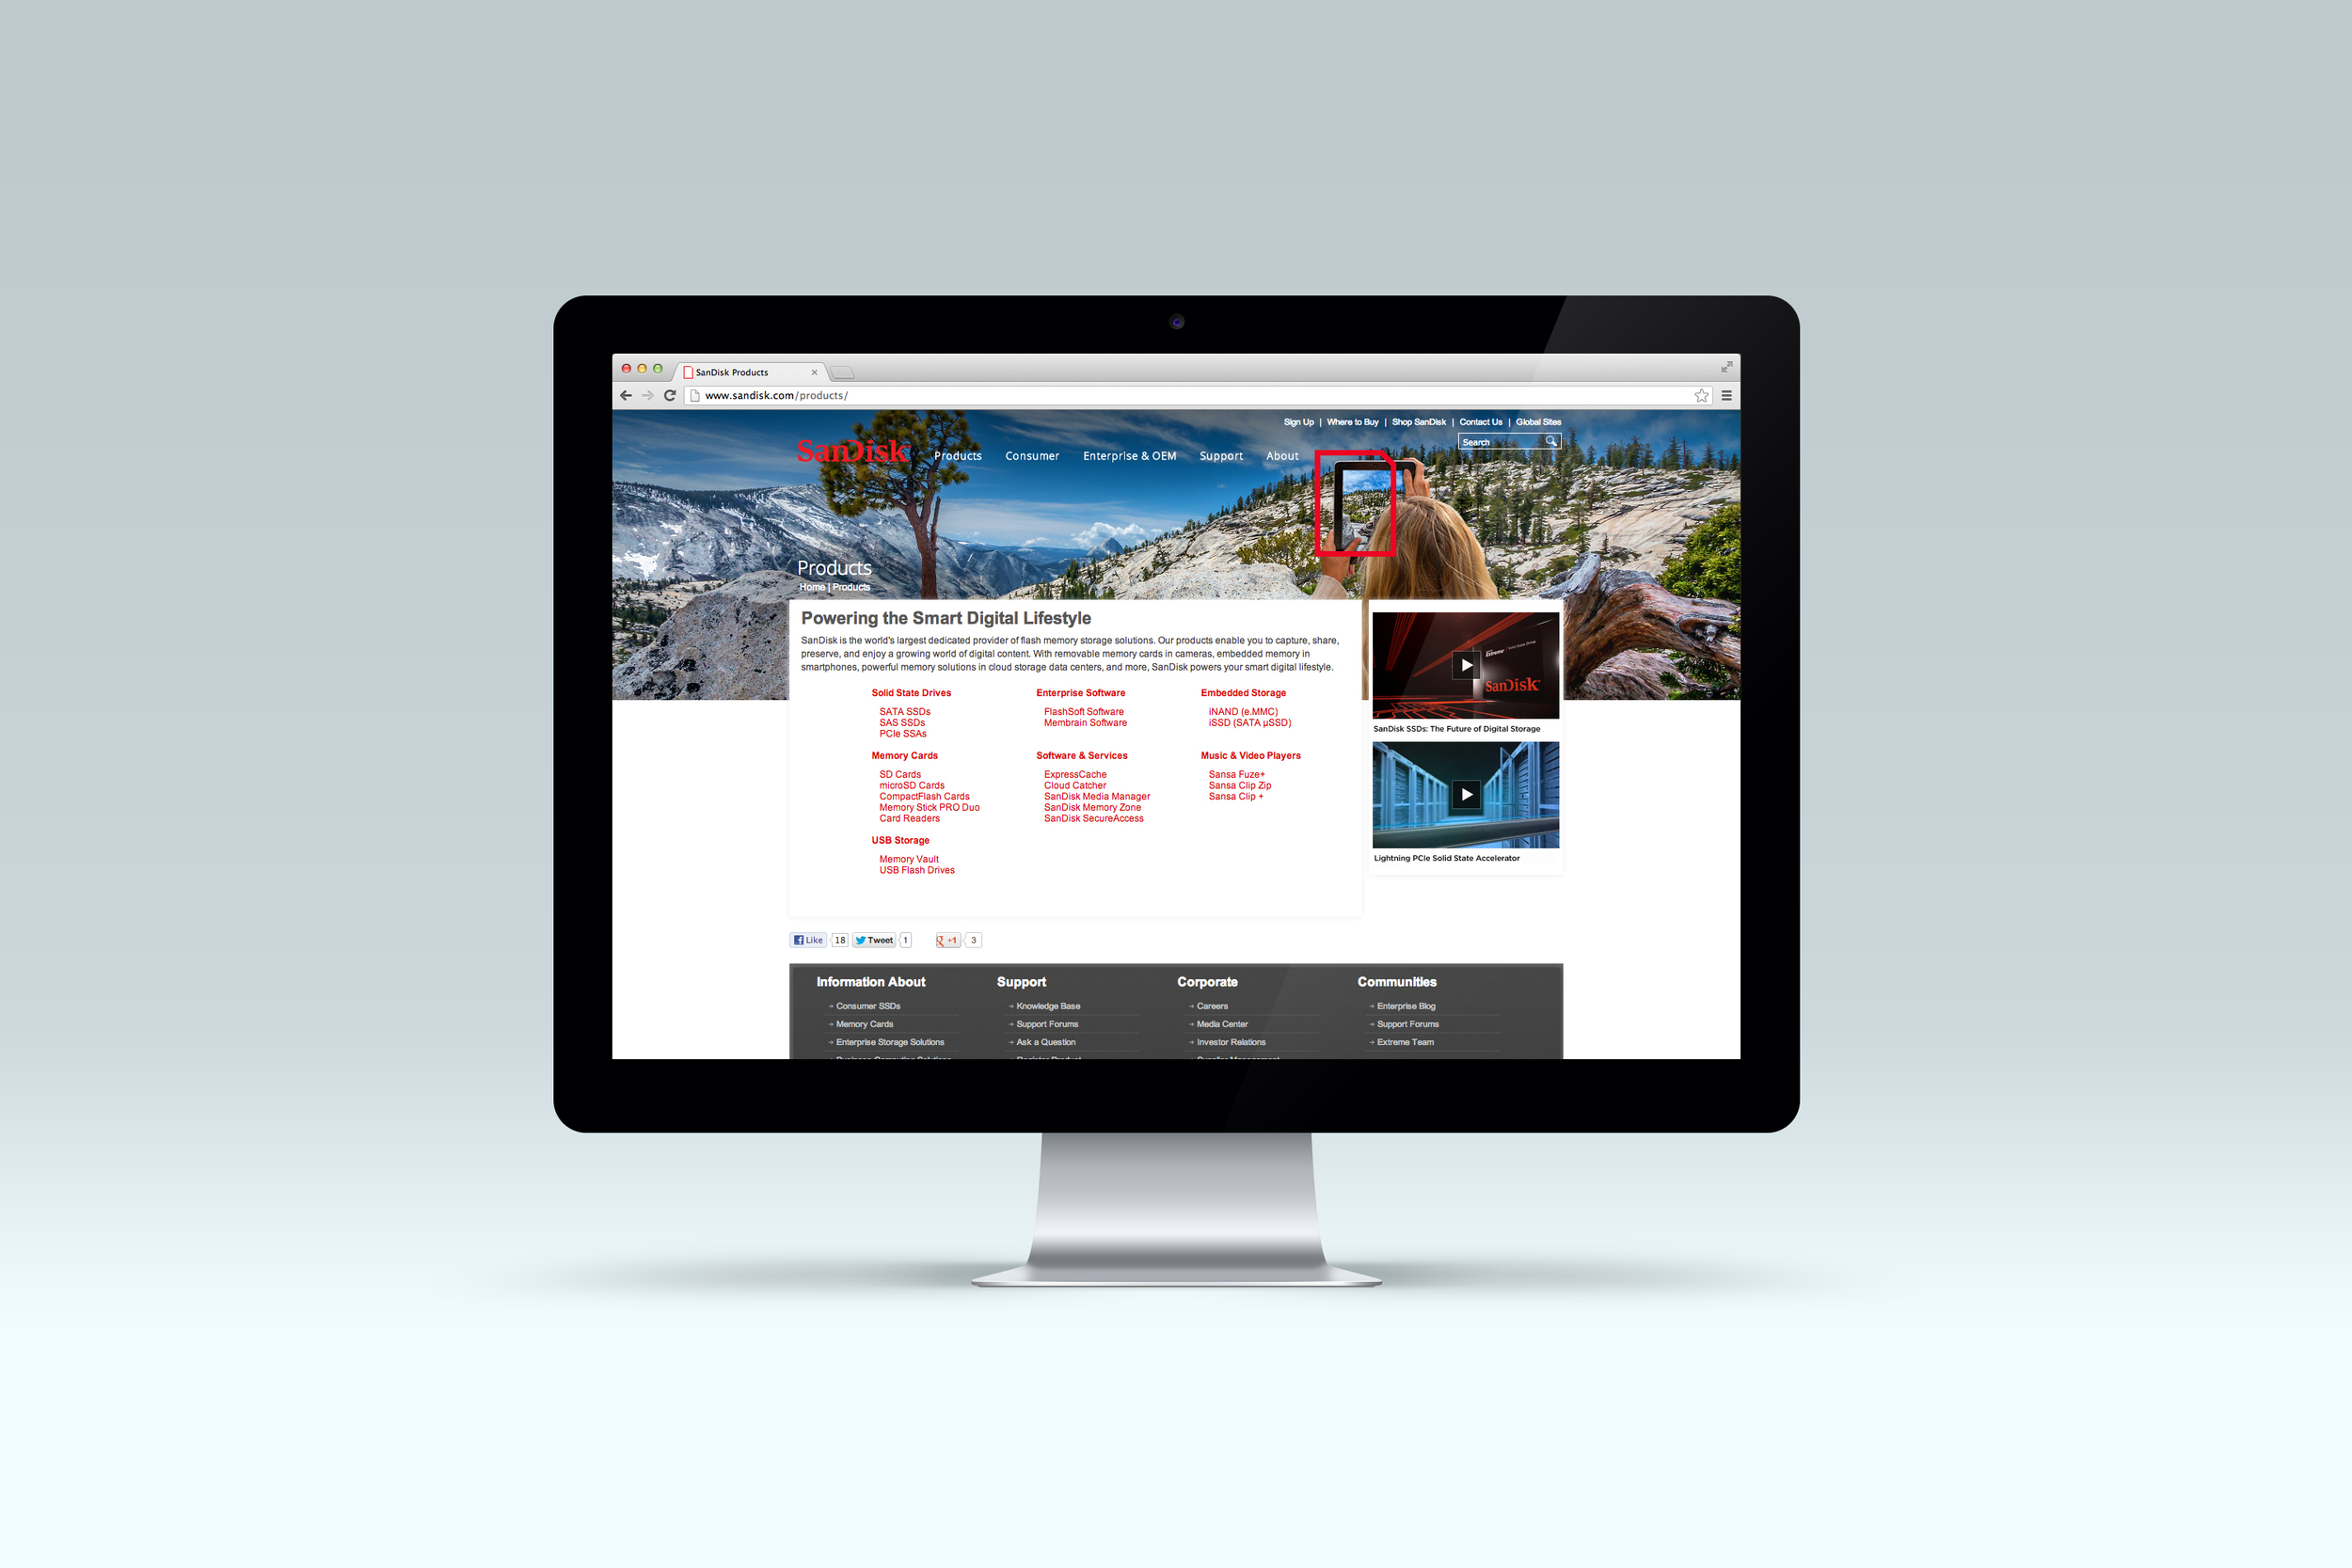 SanDisk_Website_iMac-Cinema-Monitor-Style-Mock-up_1.jpg